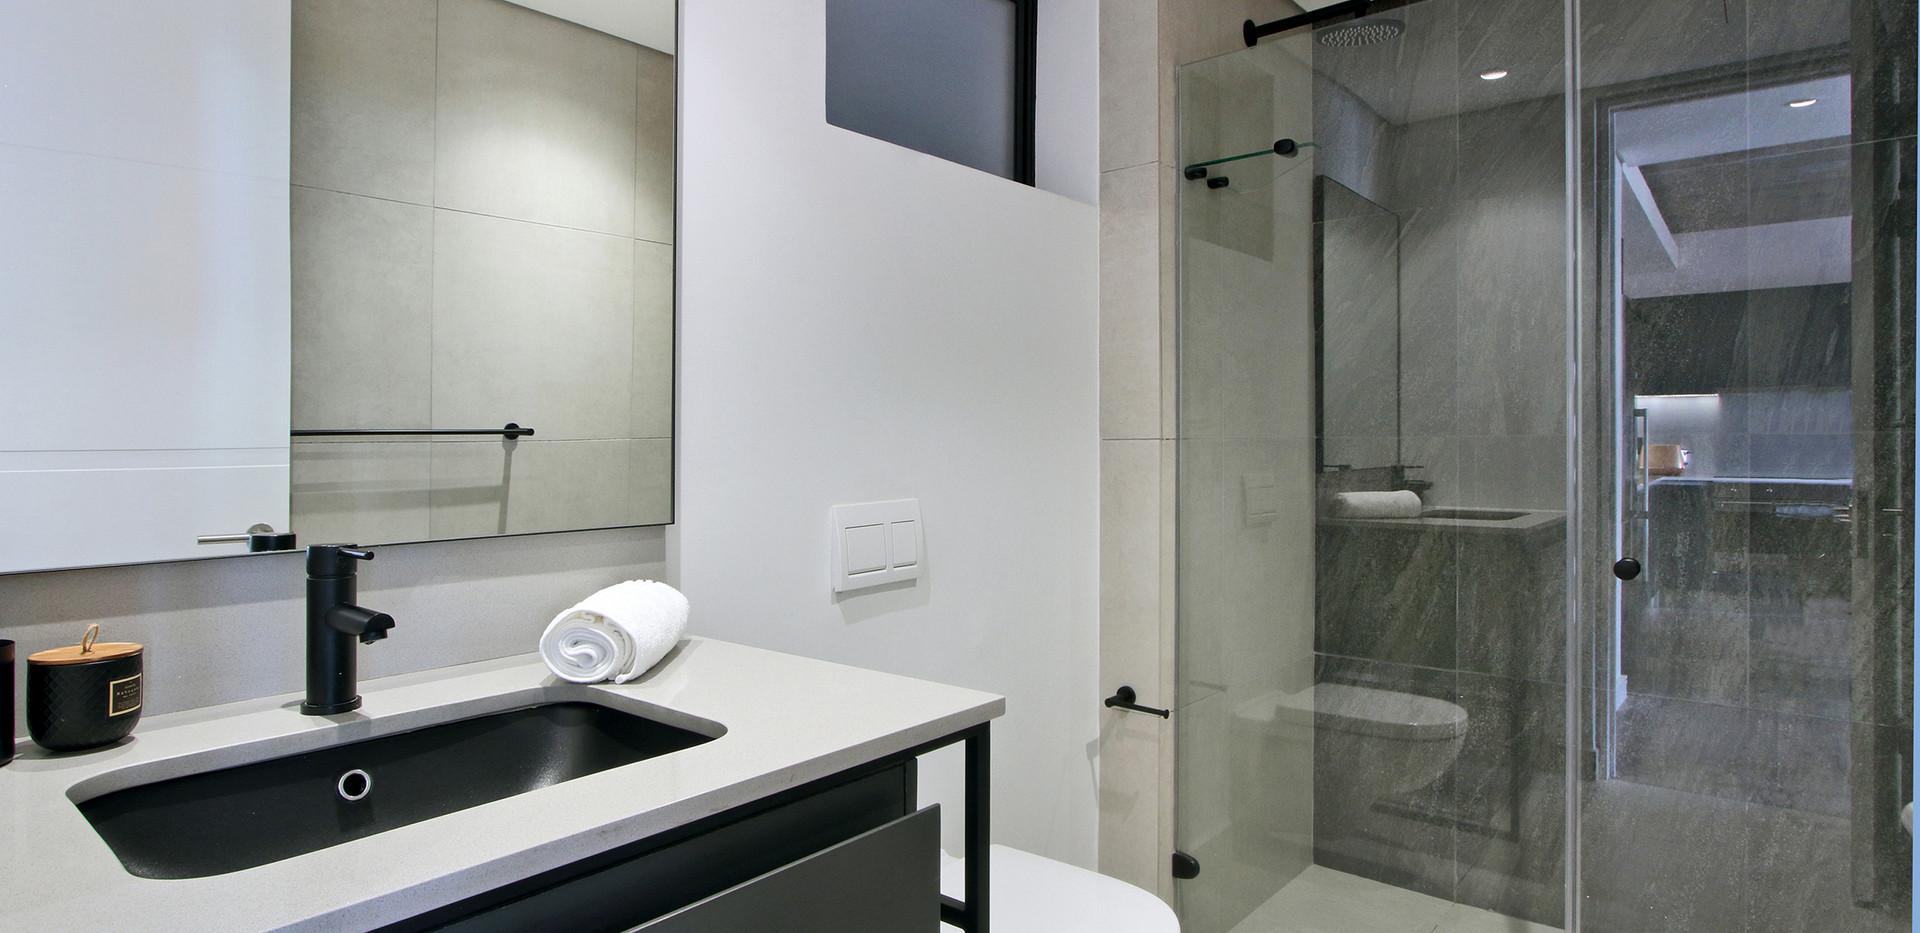 Bathroom_2bedroom_Signatura_206_ITC_2.jp